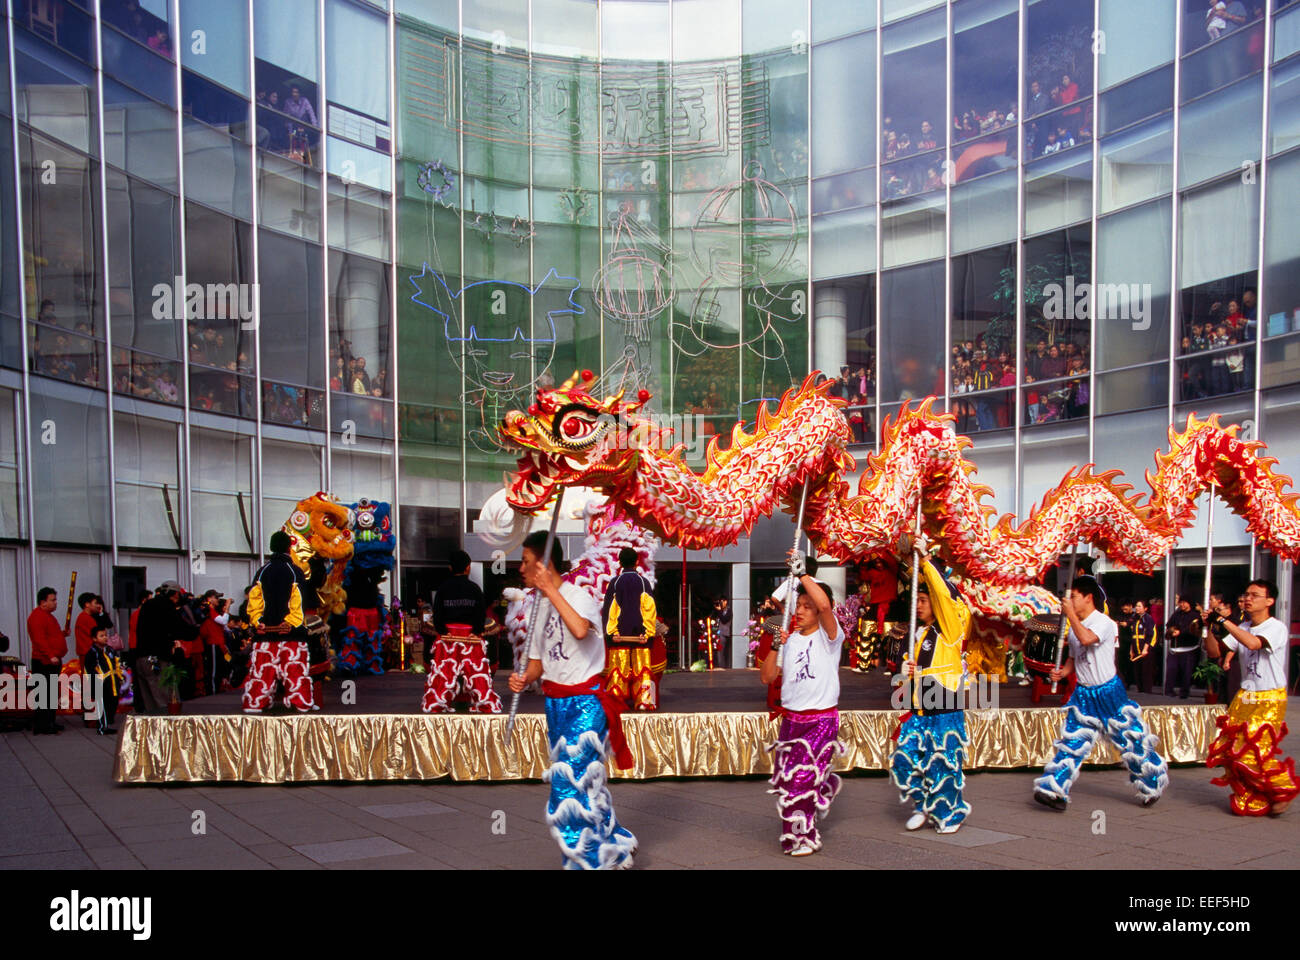 Chinese New Year Dragon Dance and Celebration, Richmond, BC, British Columbia, Canada - Stock Image